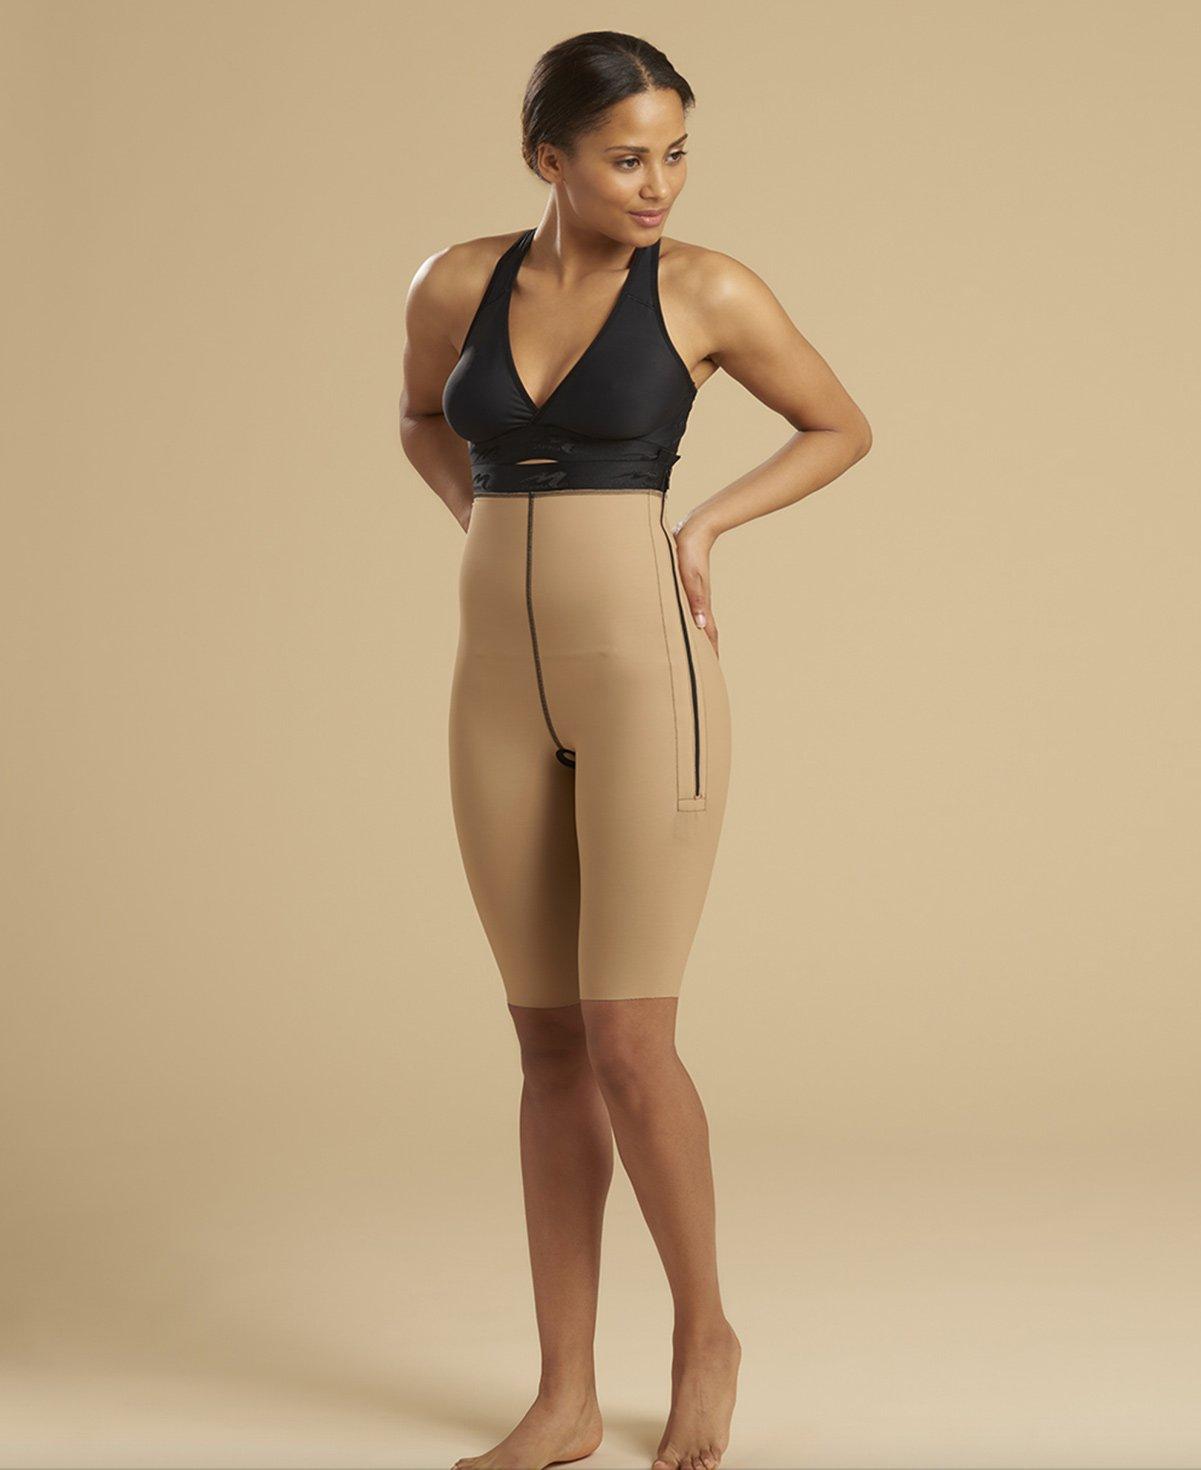 c39f32dedbf Ladies Girdle One Zip - Knee Length